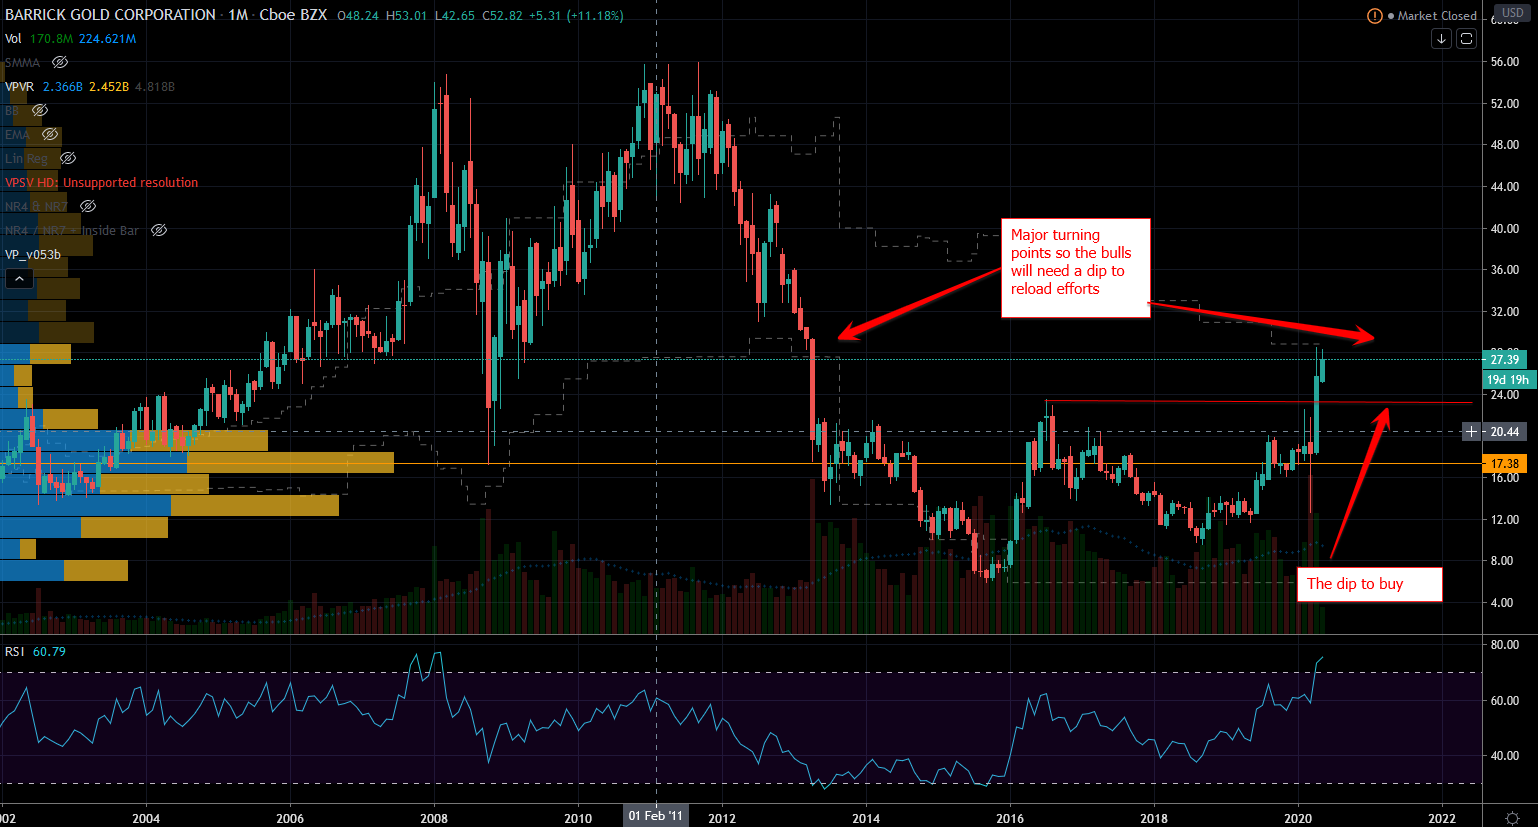 Gold Stock Chart